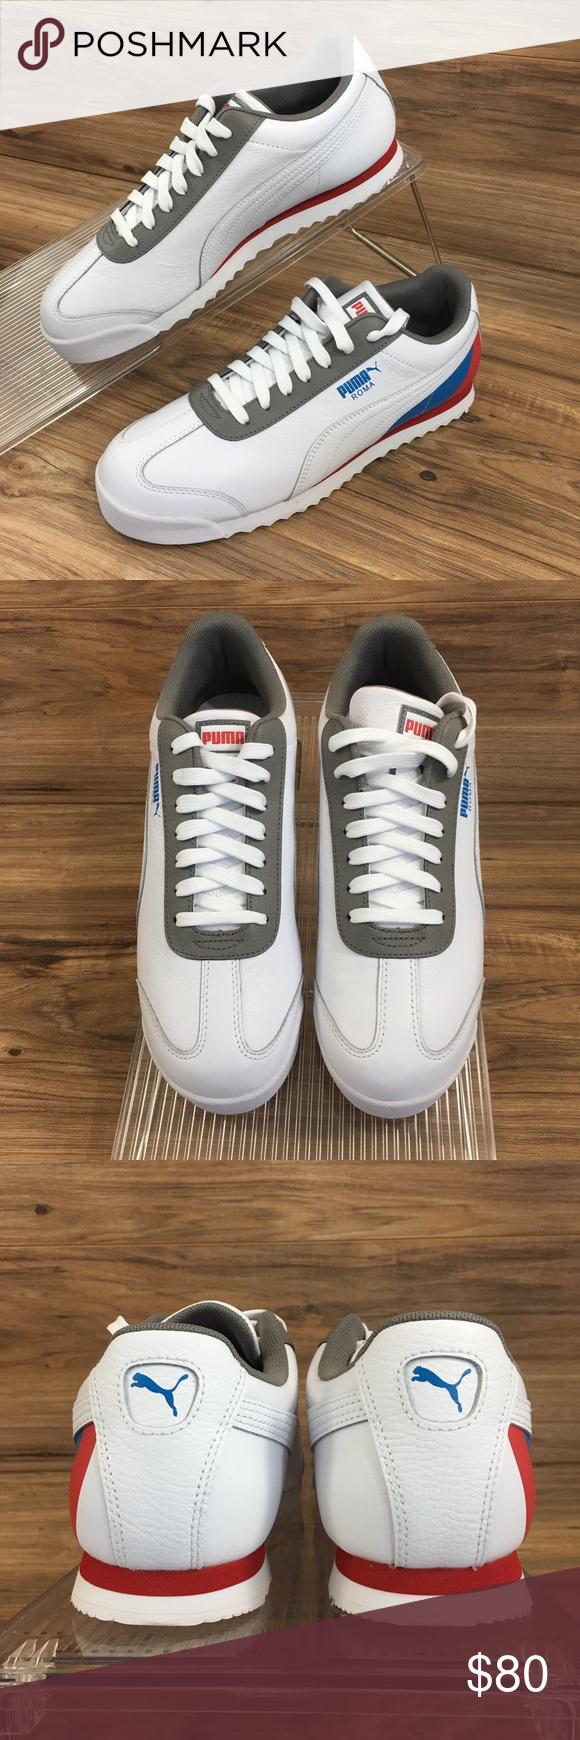 acoplador Desgracia presupuesto  Puma Mens Roma Retro Sports Shoes White New | Retro sport, Puma mens, Sport  sneakers